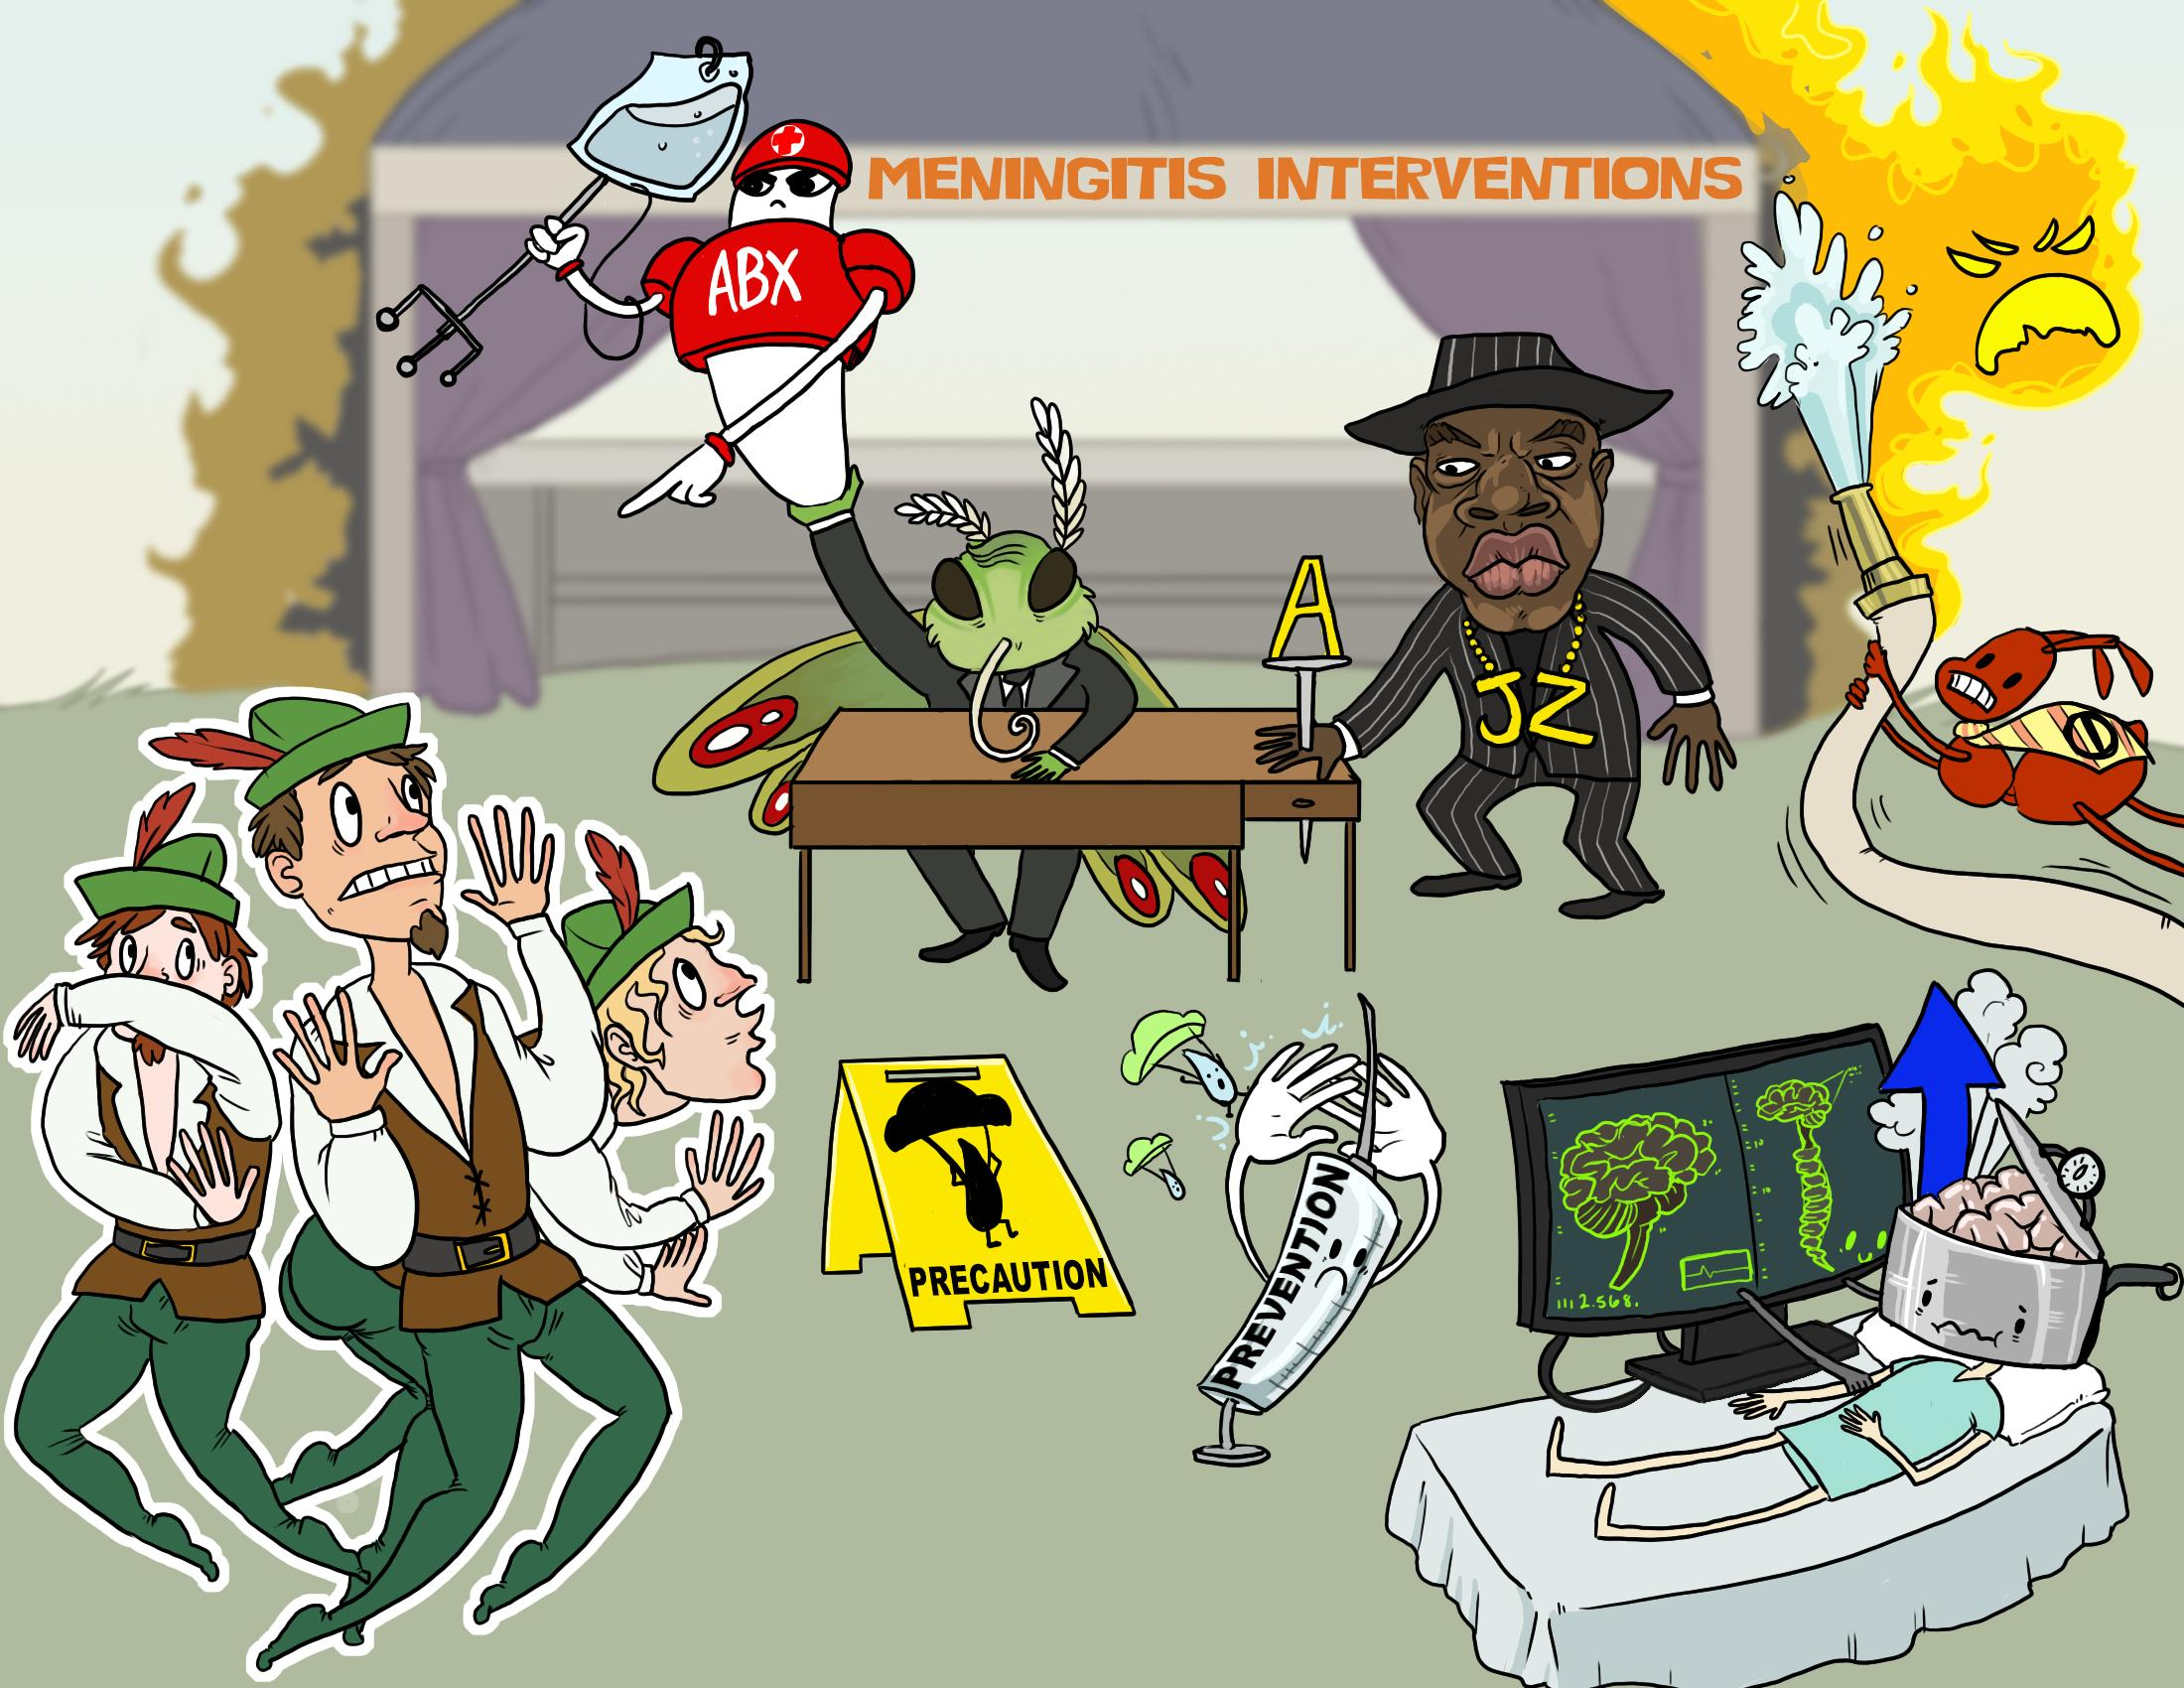 Meningitis Interventions